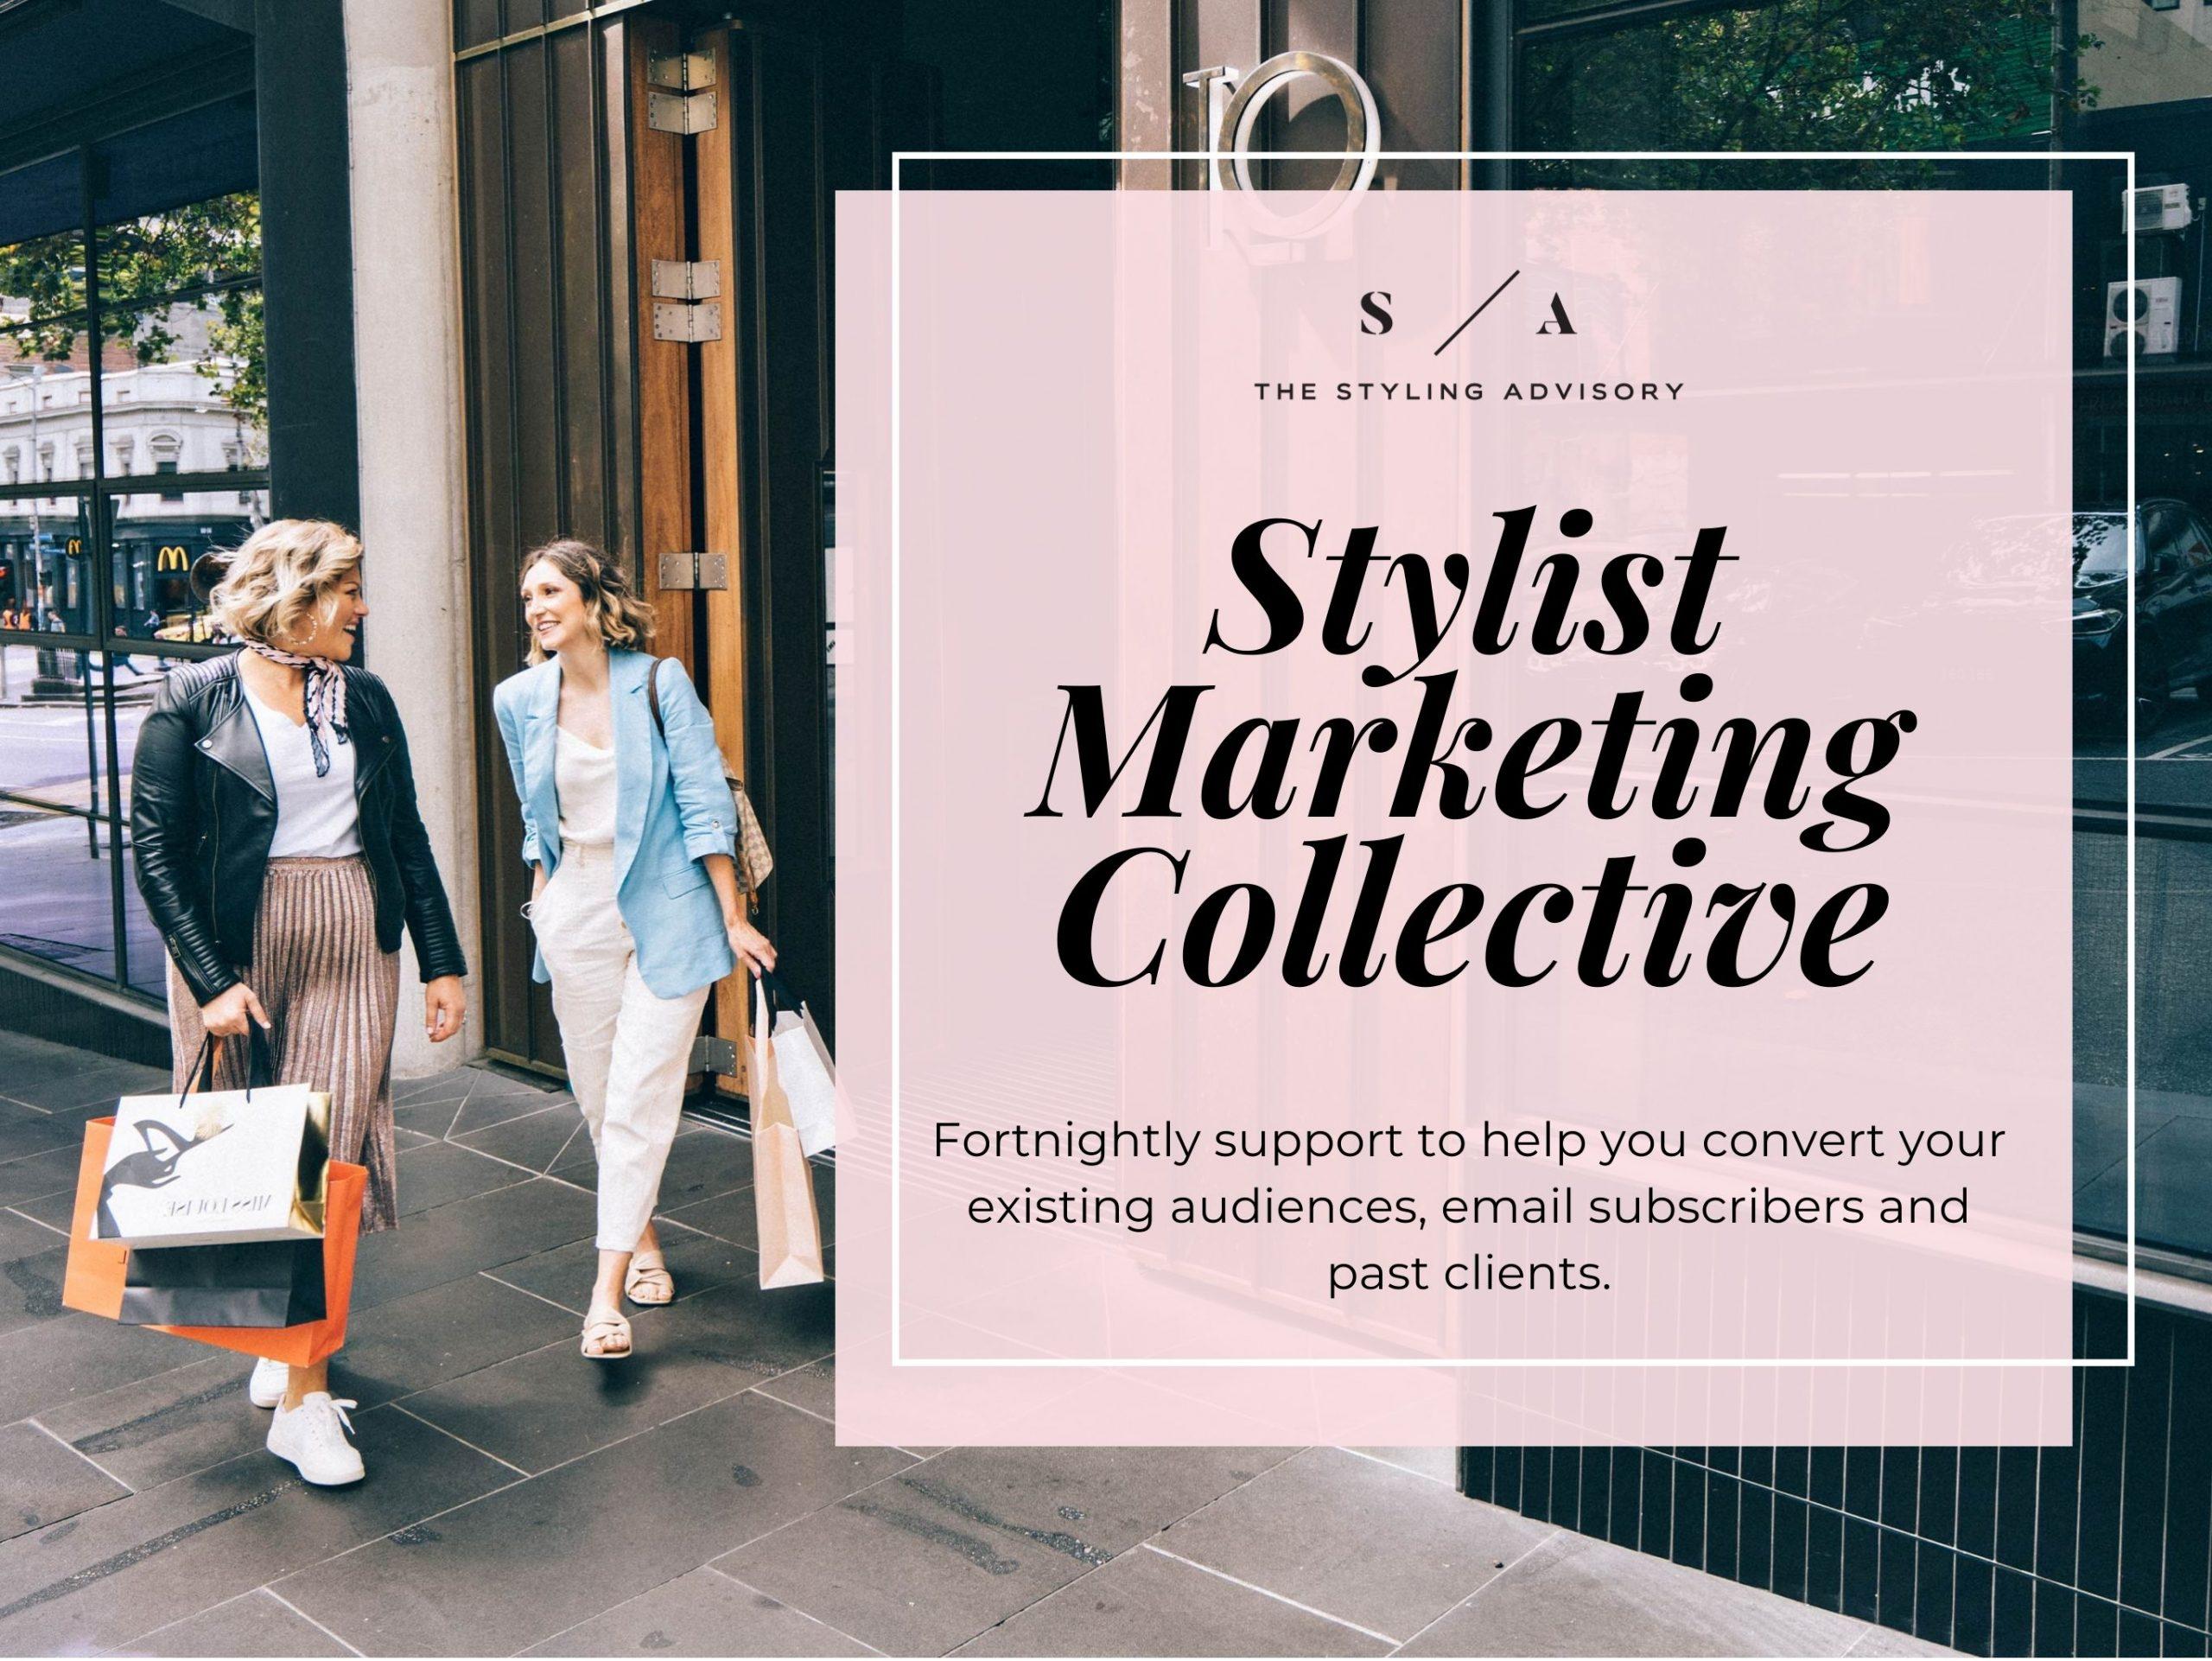 Stylist Marketing Collective